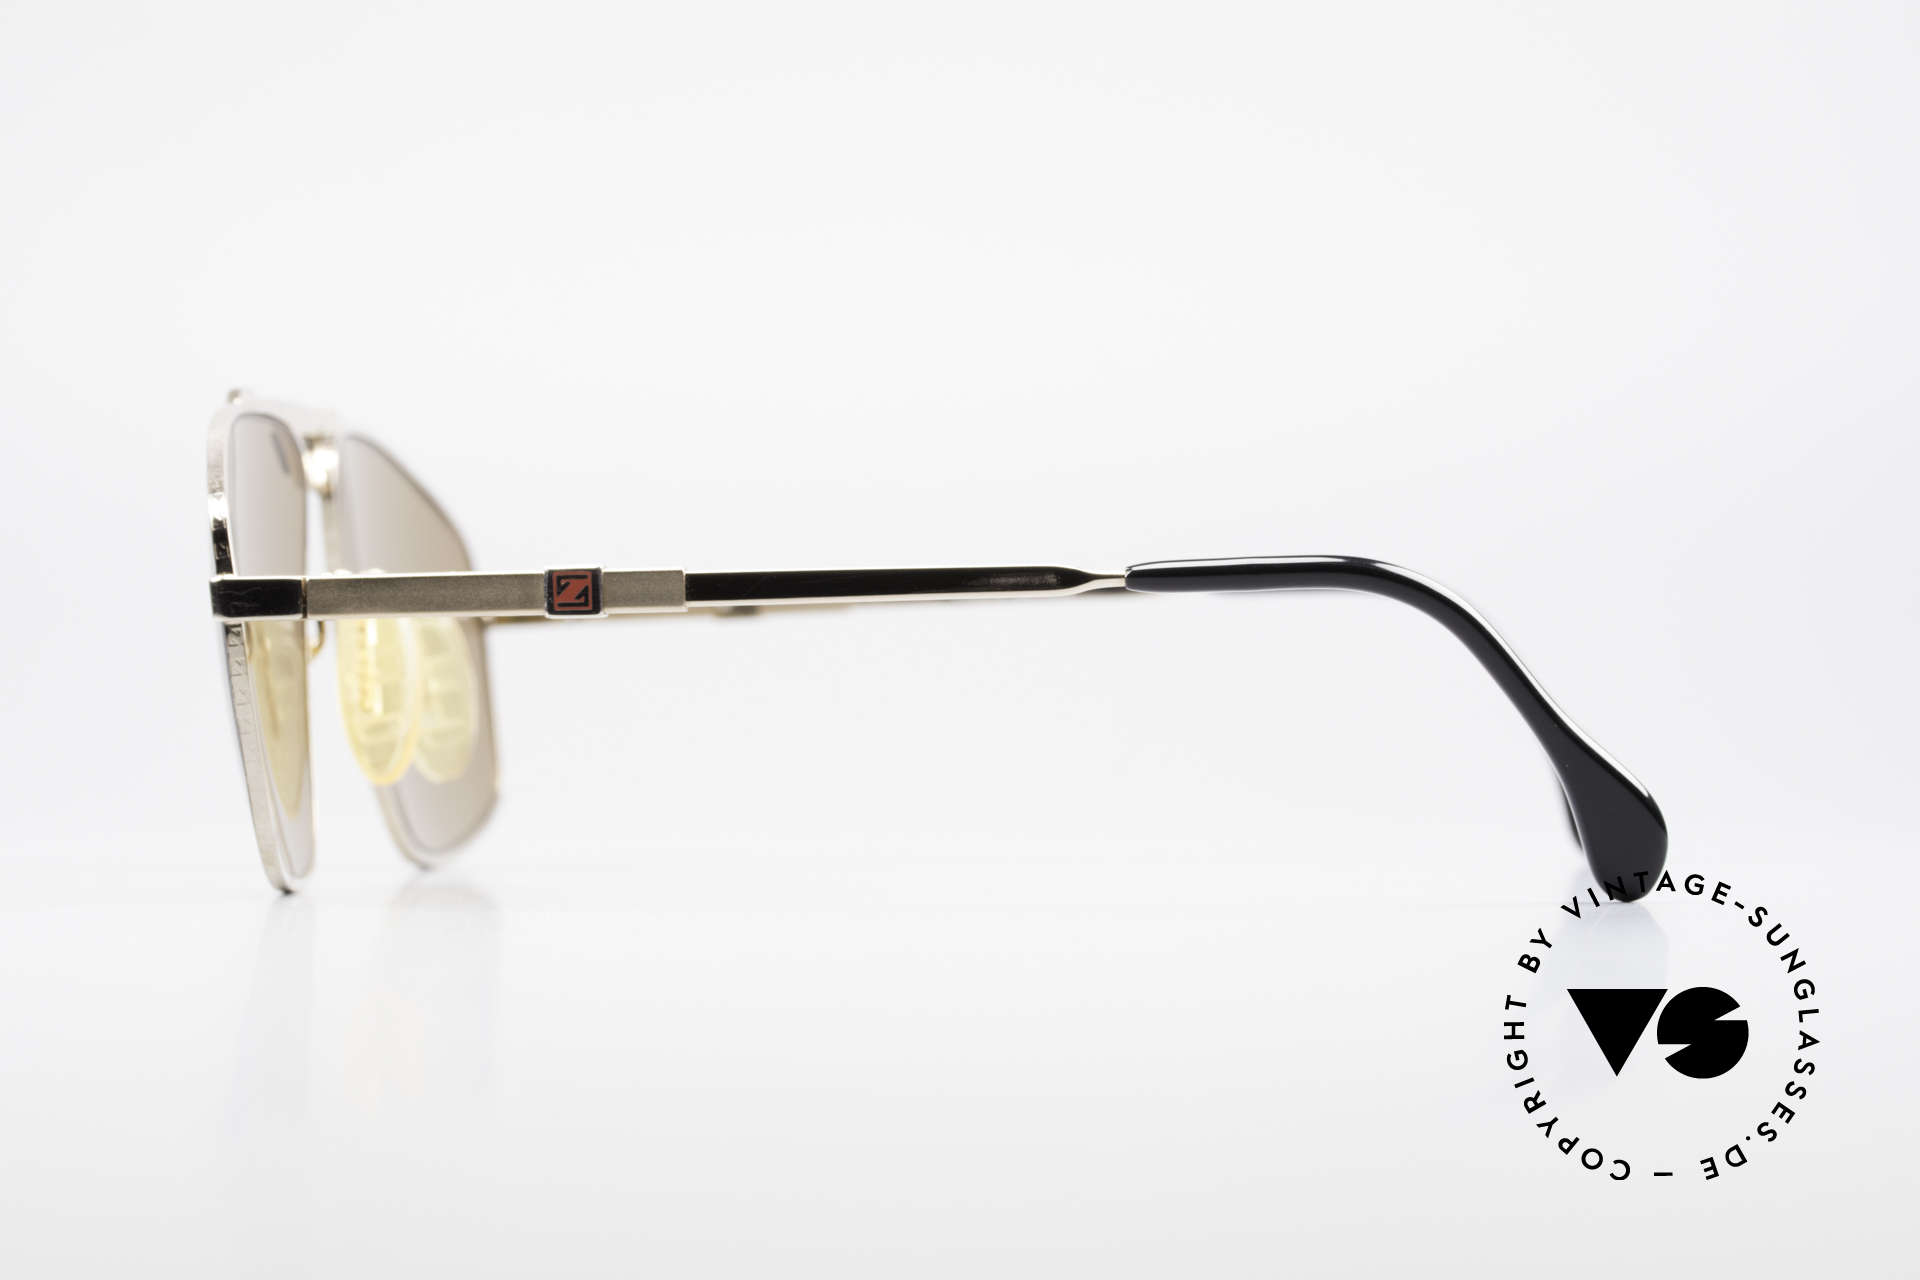 Zeiss 9925 Gentlemen's 80's Sunglasses, NO RETRO SHADES, but TRUE VINTAGE 80's sunglasses, Made for Men